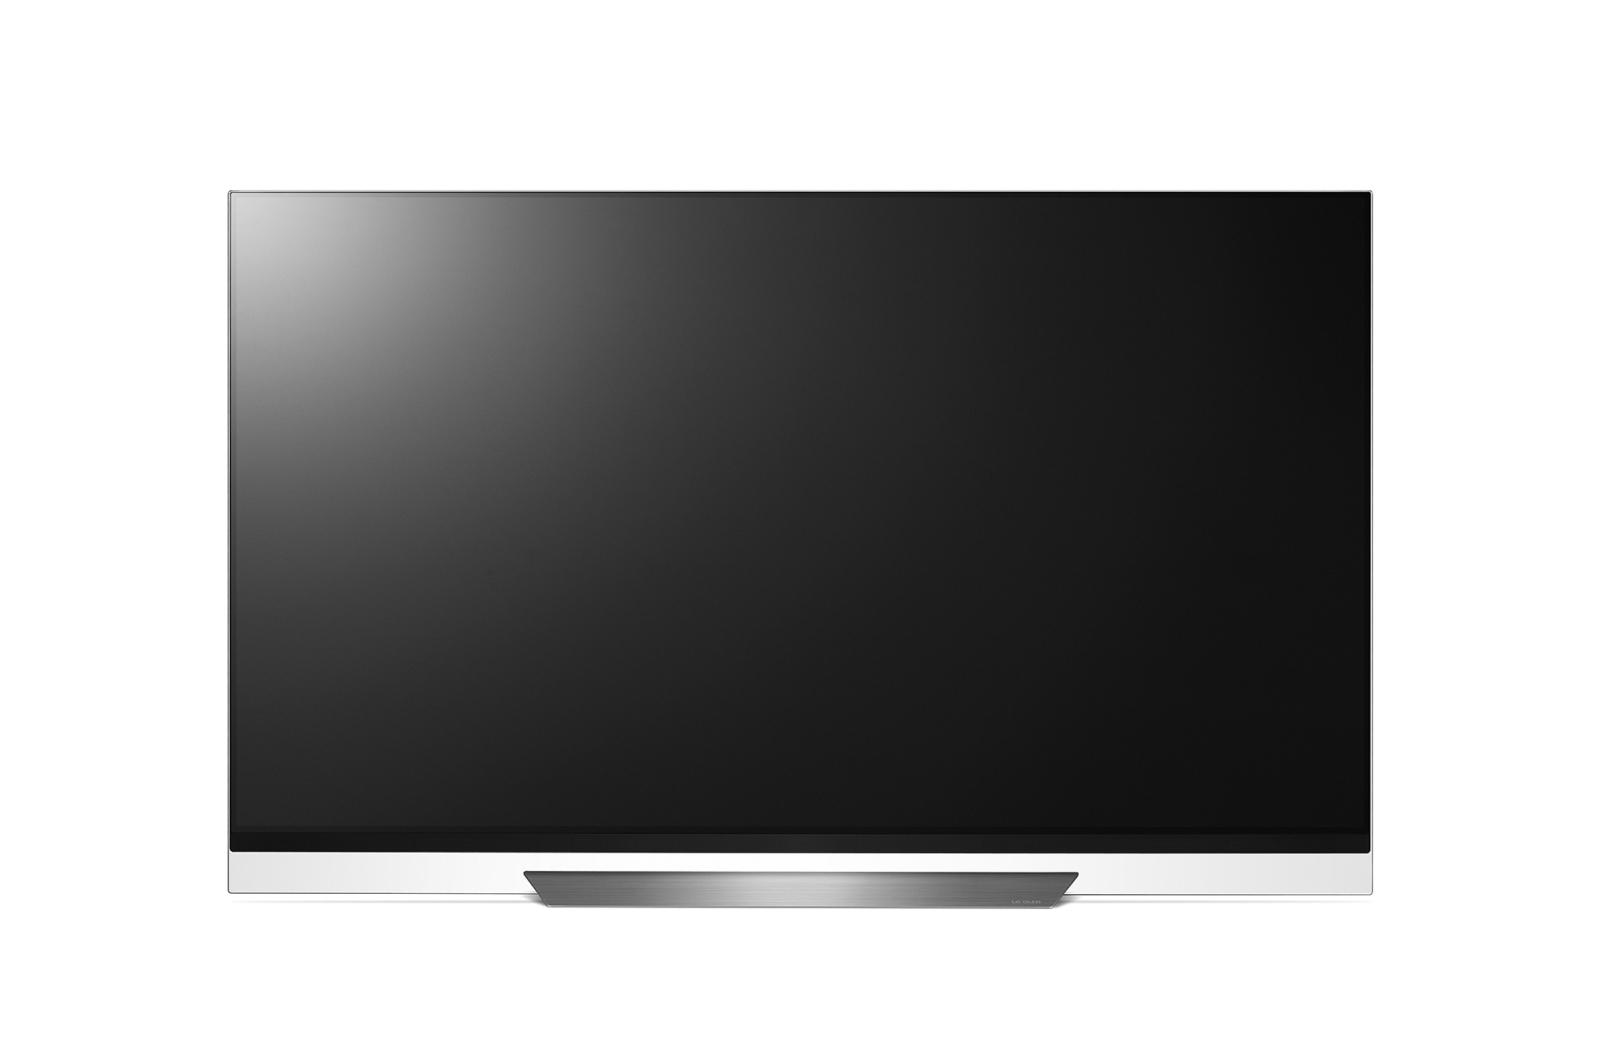 LG OLED65E8PLA telewizor premium OLED ! DOSTĘPNY OD RĘKI !